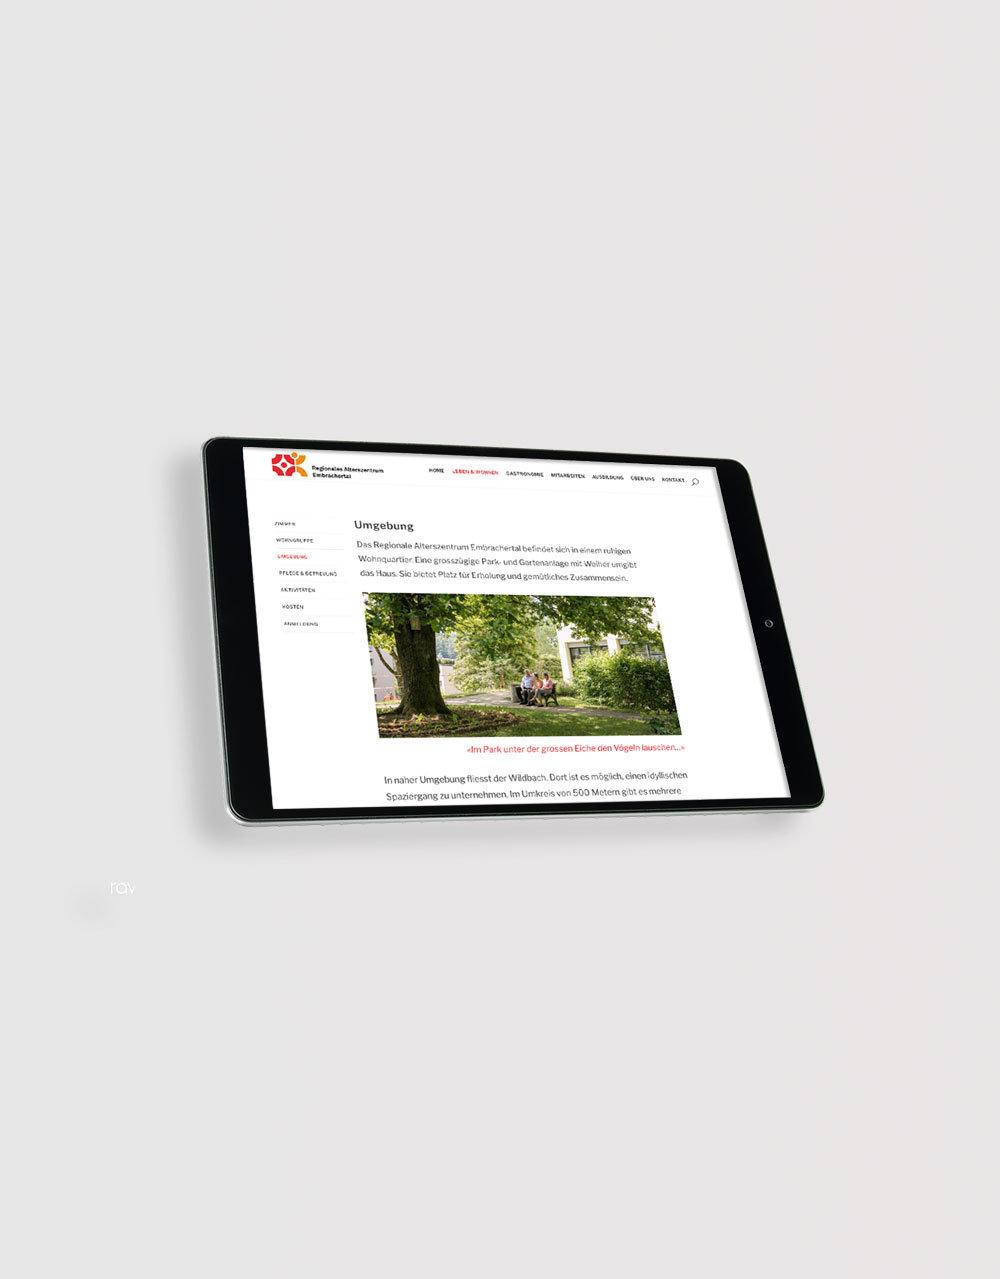 Webdesign, www az-embrachertal.ch, Layout, Konzept, Realisation, Vorschau